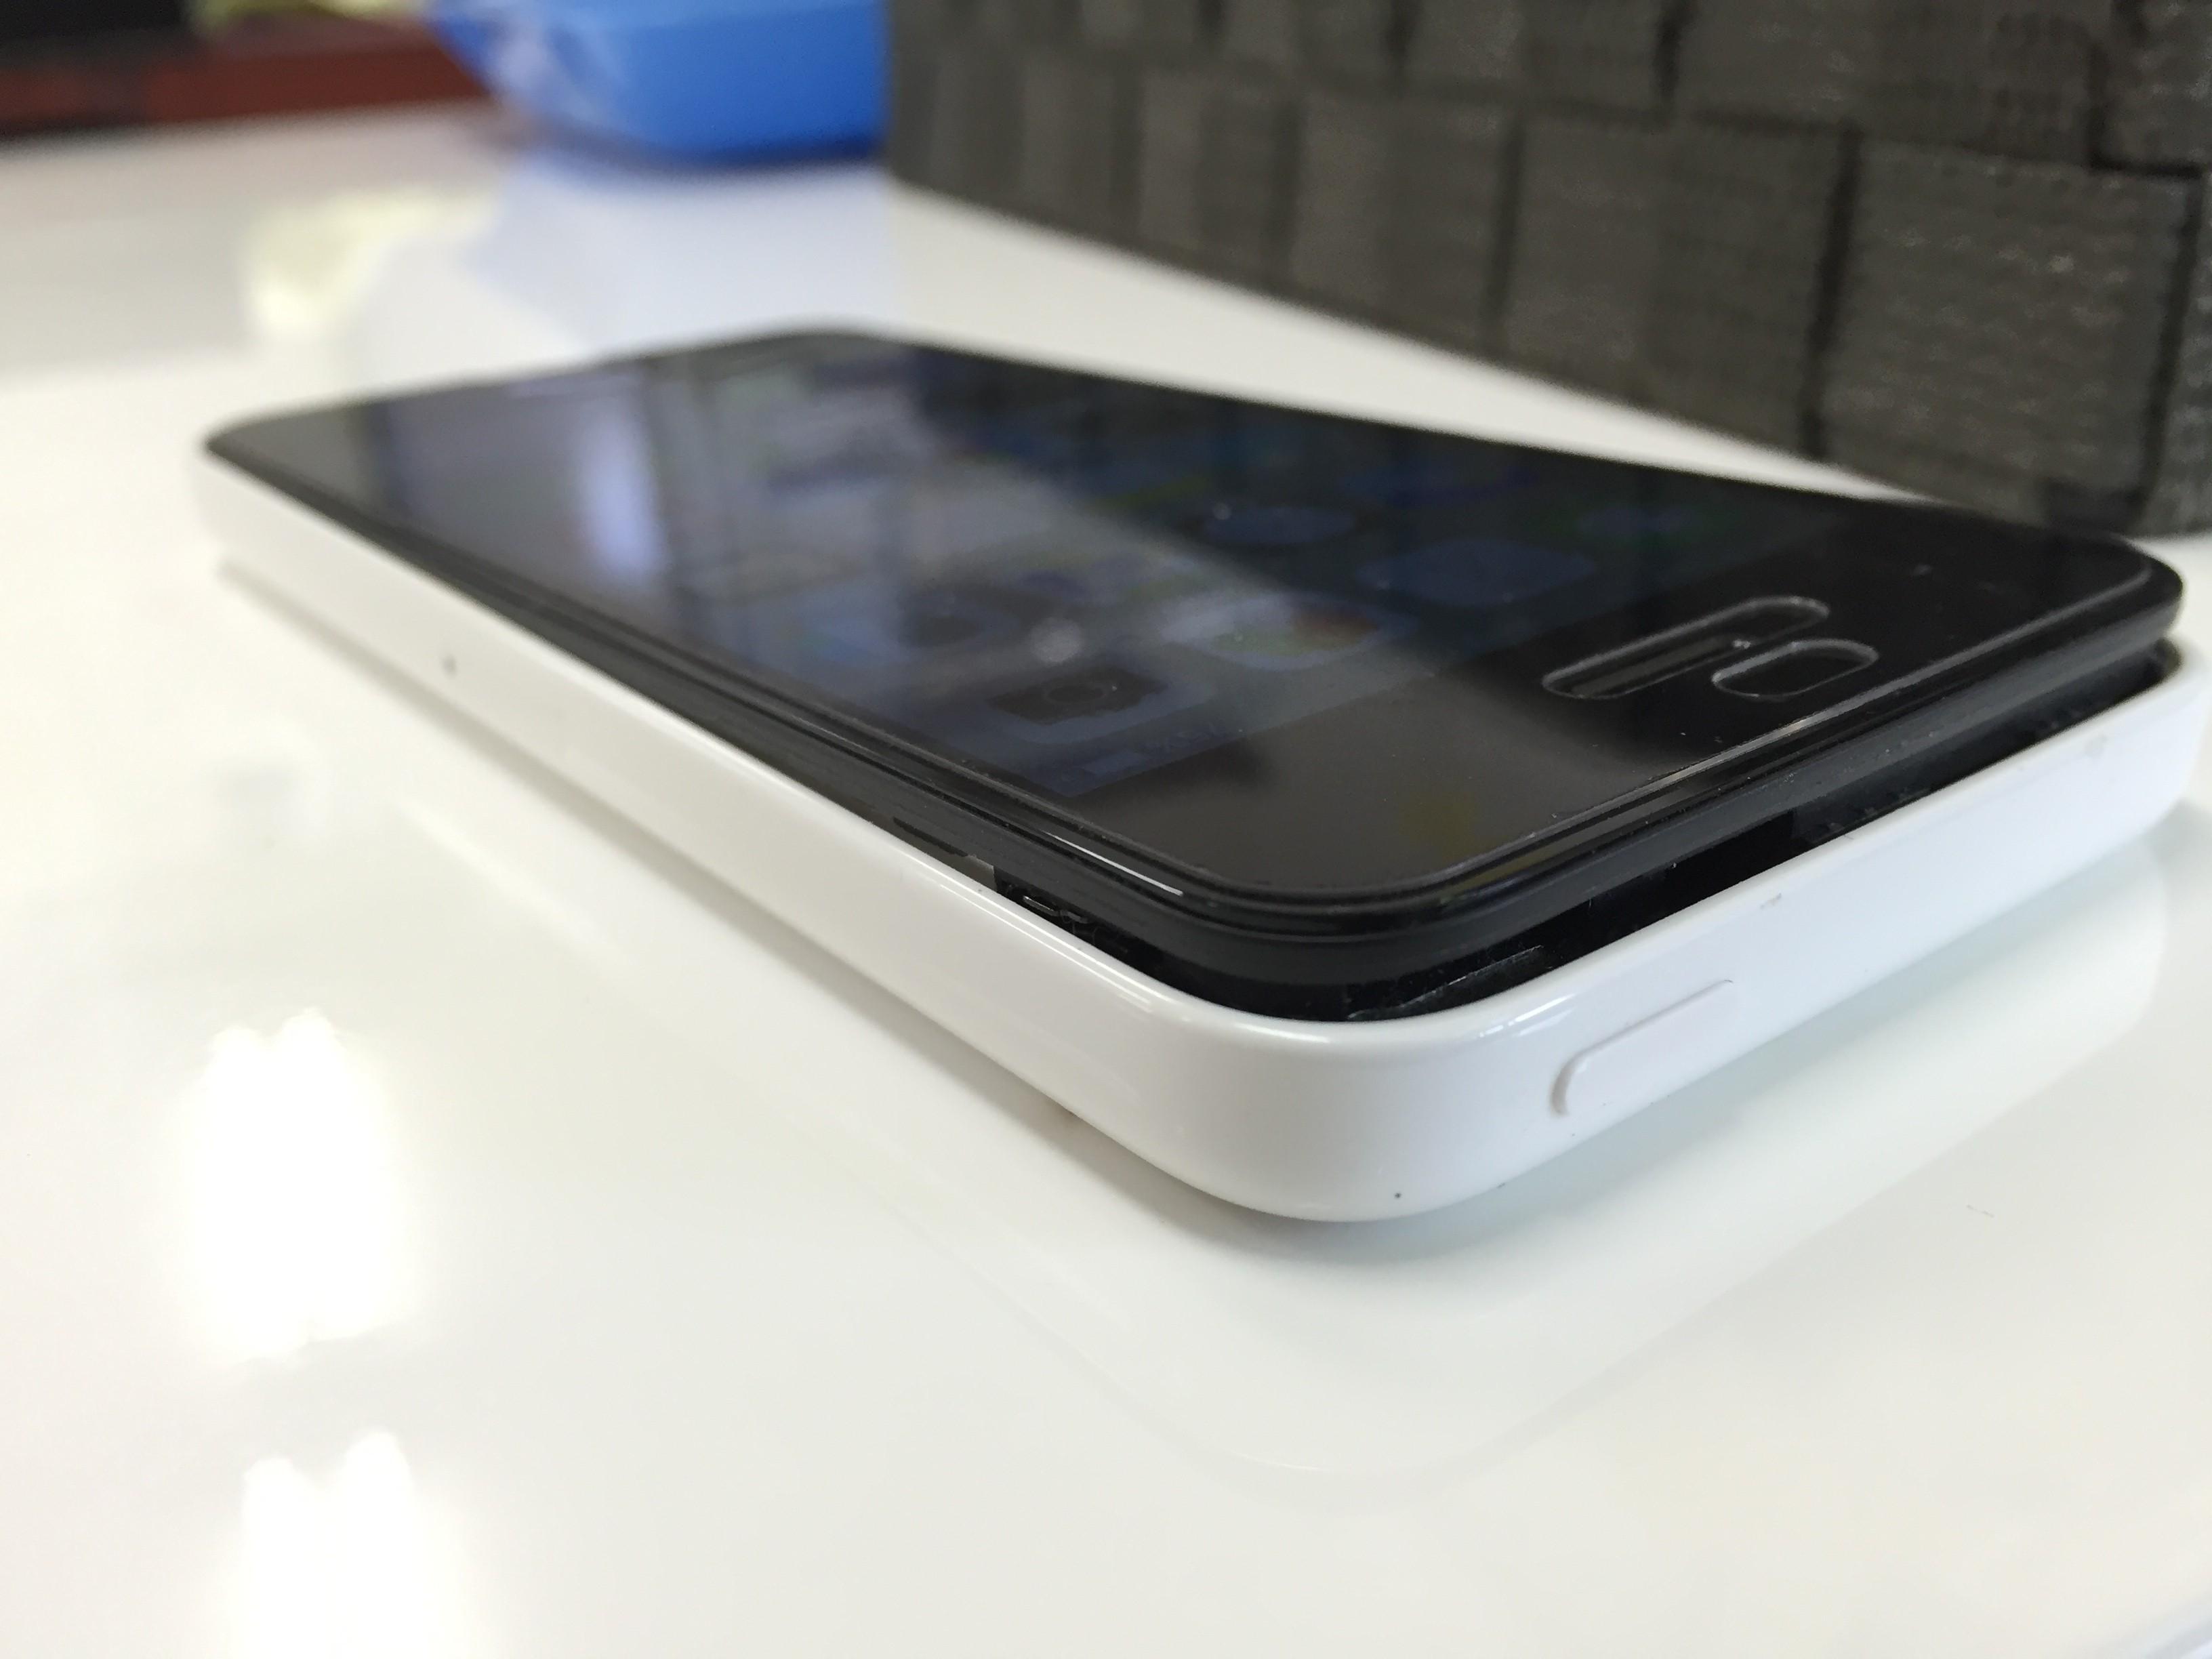 bc17a52c9ac iPhone5シリーズで画面浮きに悩まされる方が続出!?そのワケとは ...